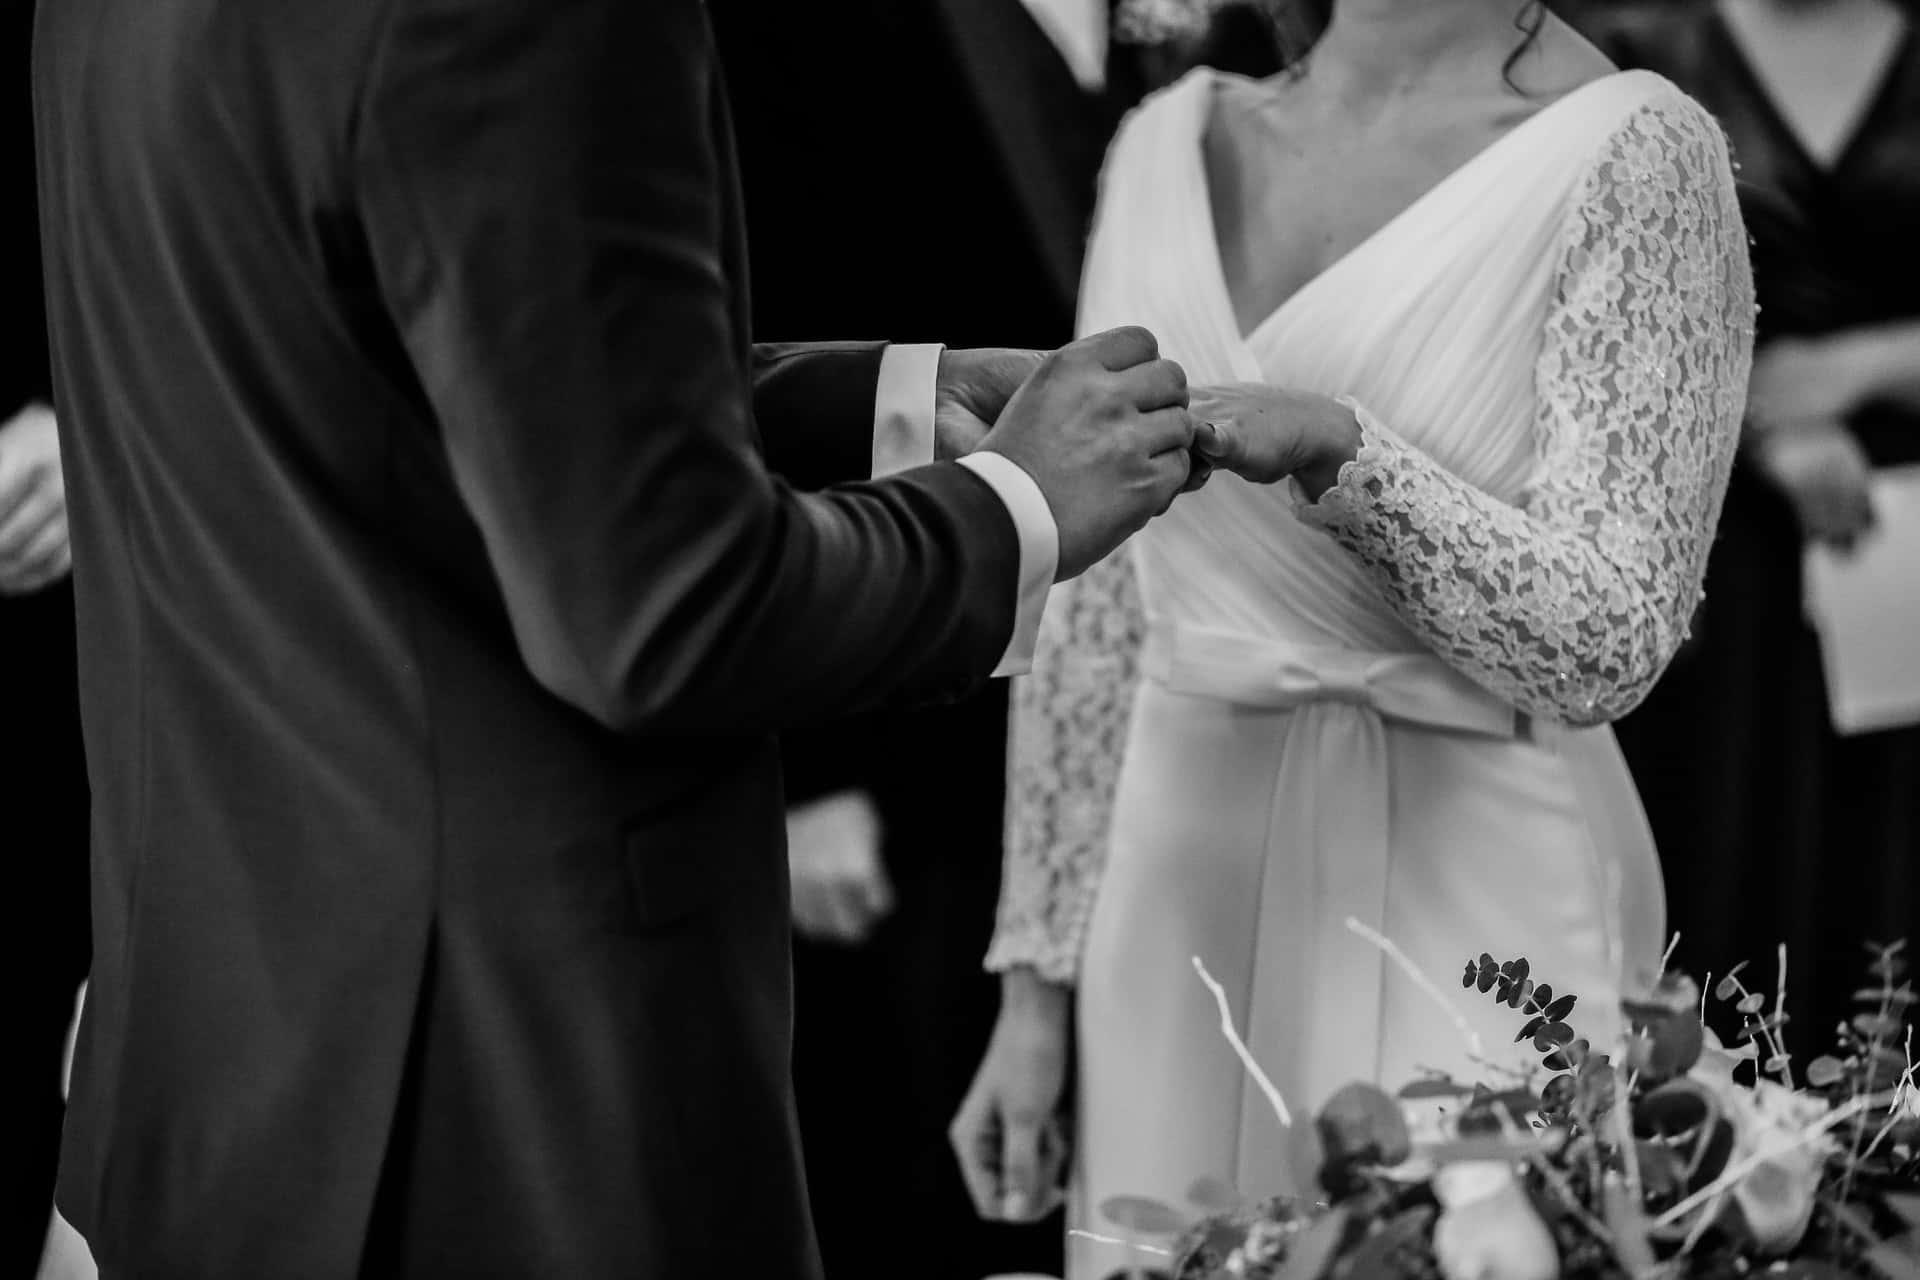 Wedding planer bridezilla